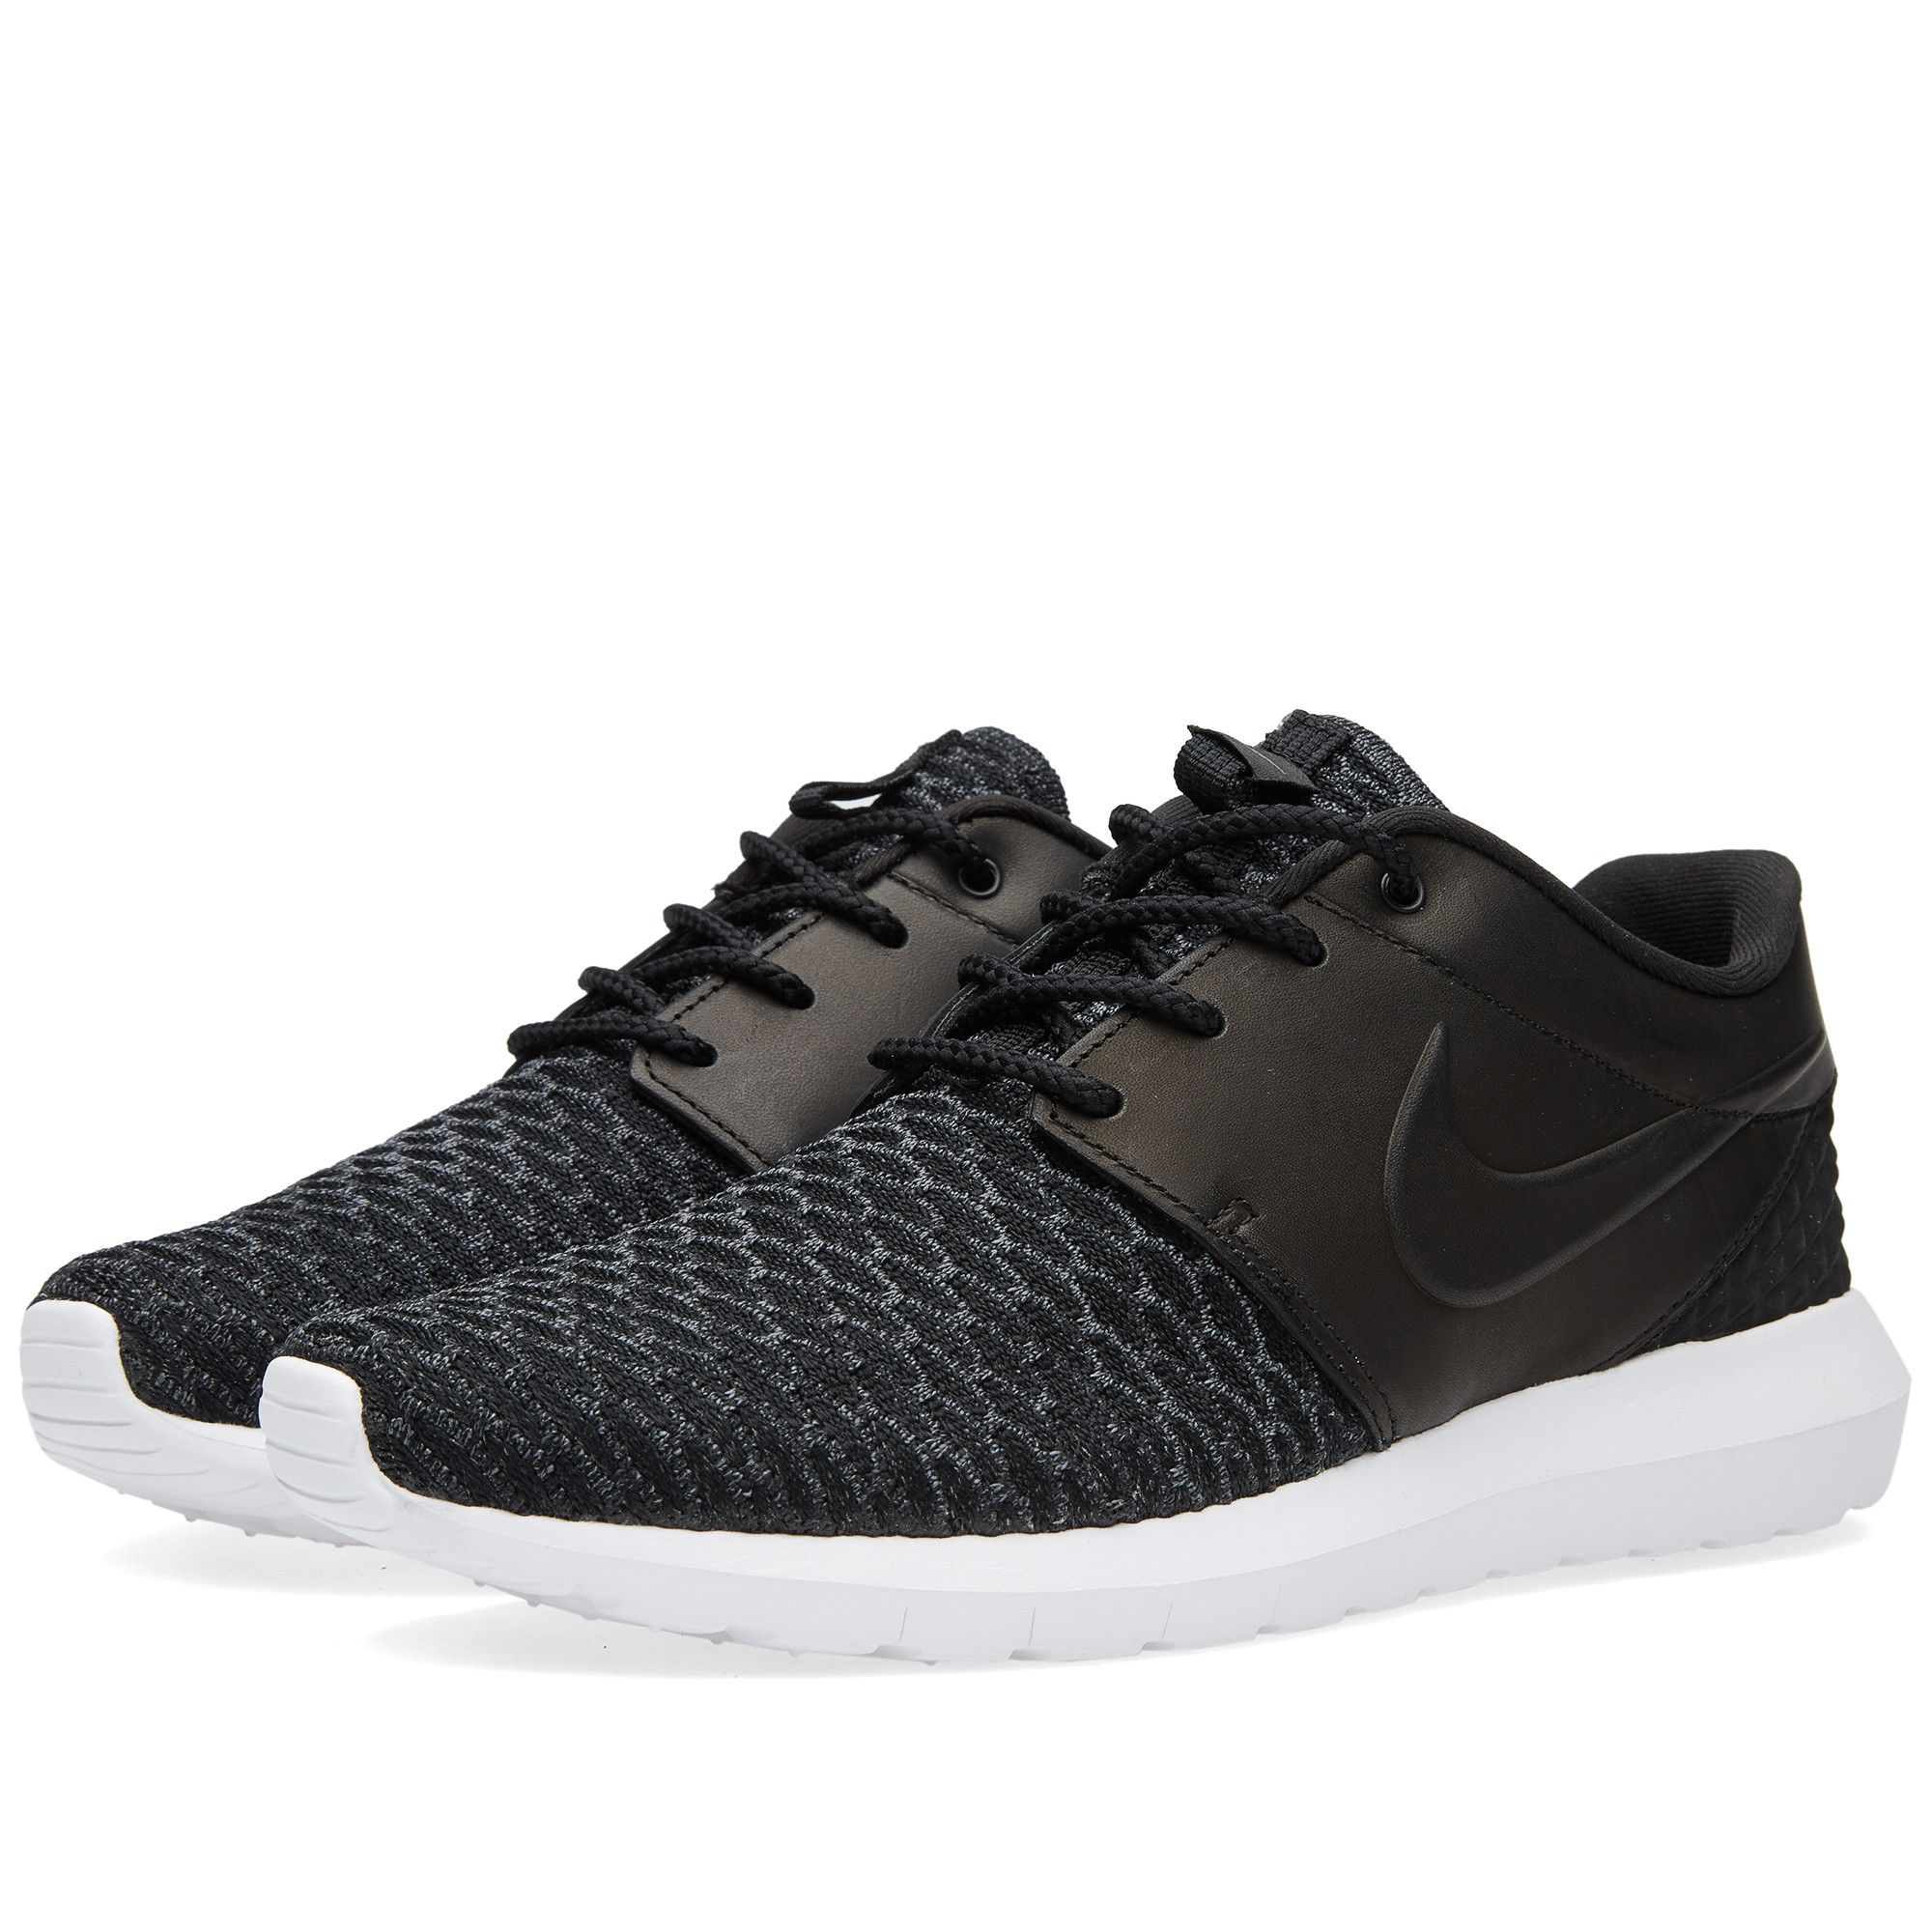 huge discount e55f0 adb46 Nike Roshe One NM Flyknit Premium (Black, Dark Grey   White)